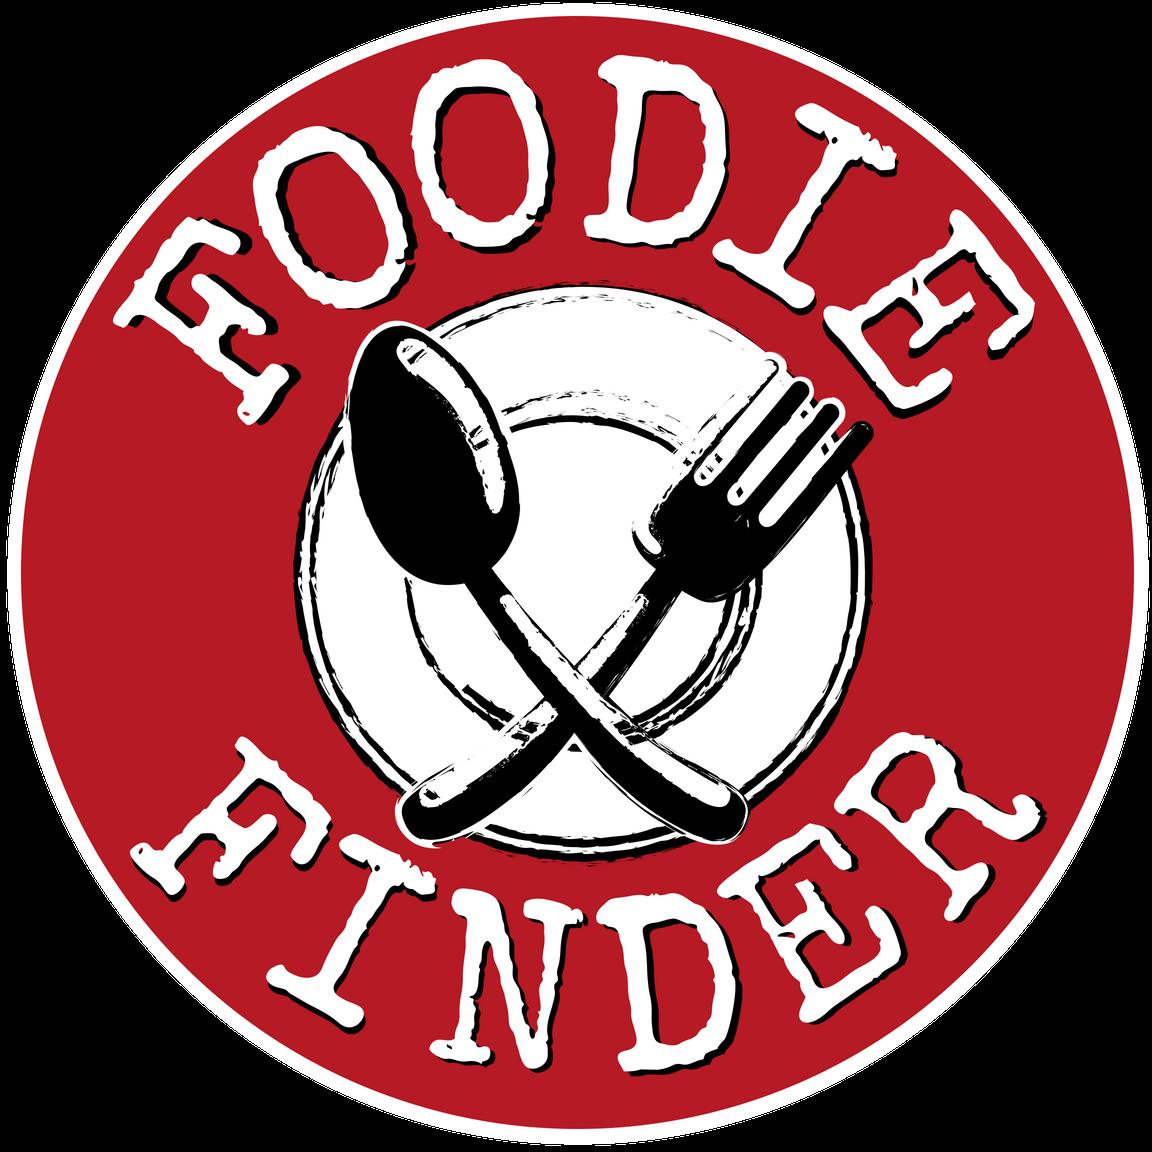 FoodieFinder LOGO - Original (1)